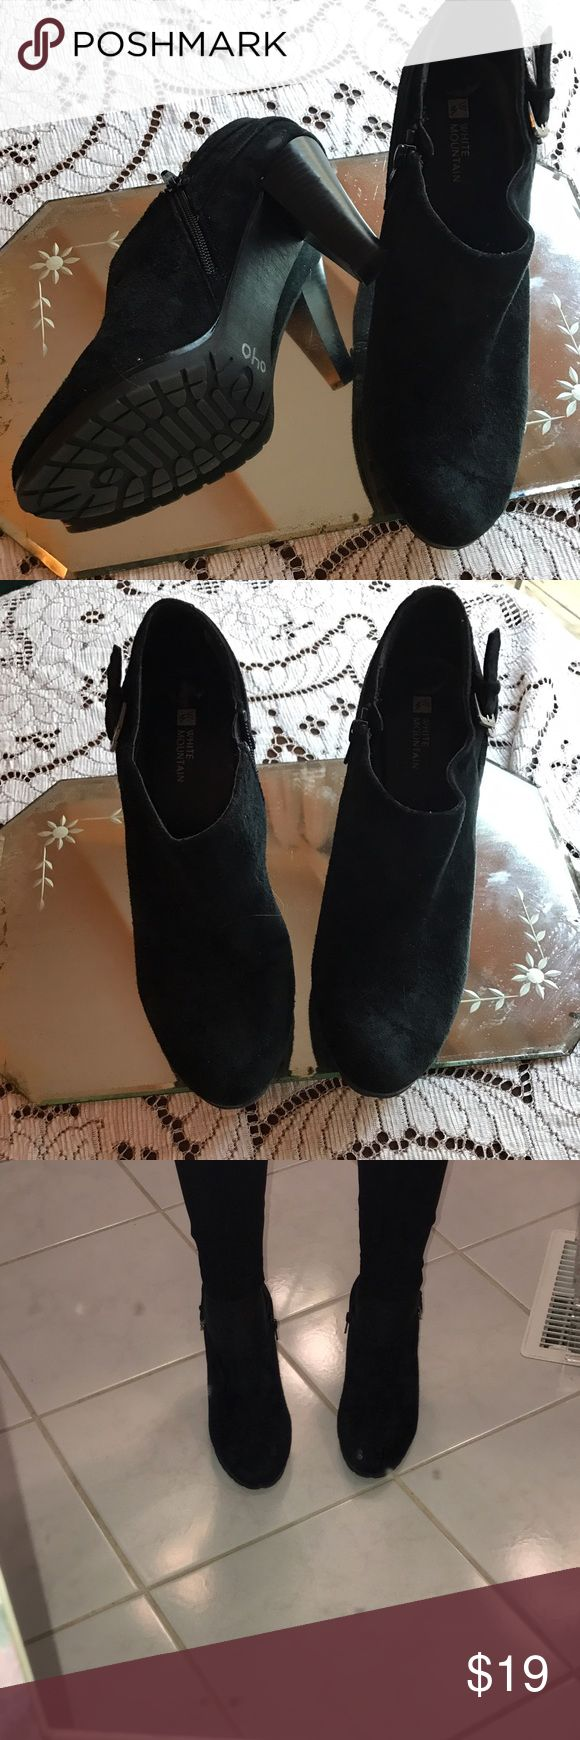 Suede look shoe tees Suede look black shoe tees. Side zipper. Comfortable white mountain shoes white mountain Shoes